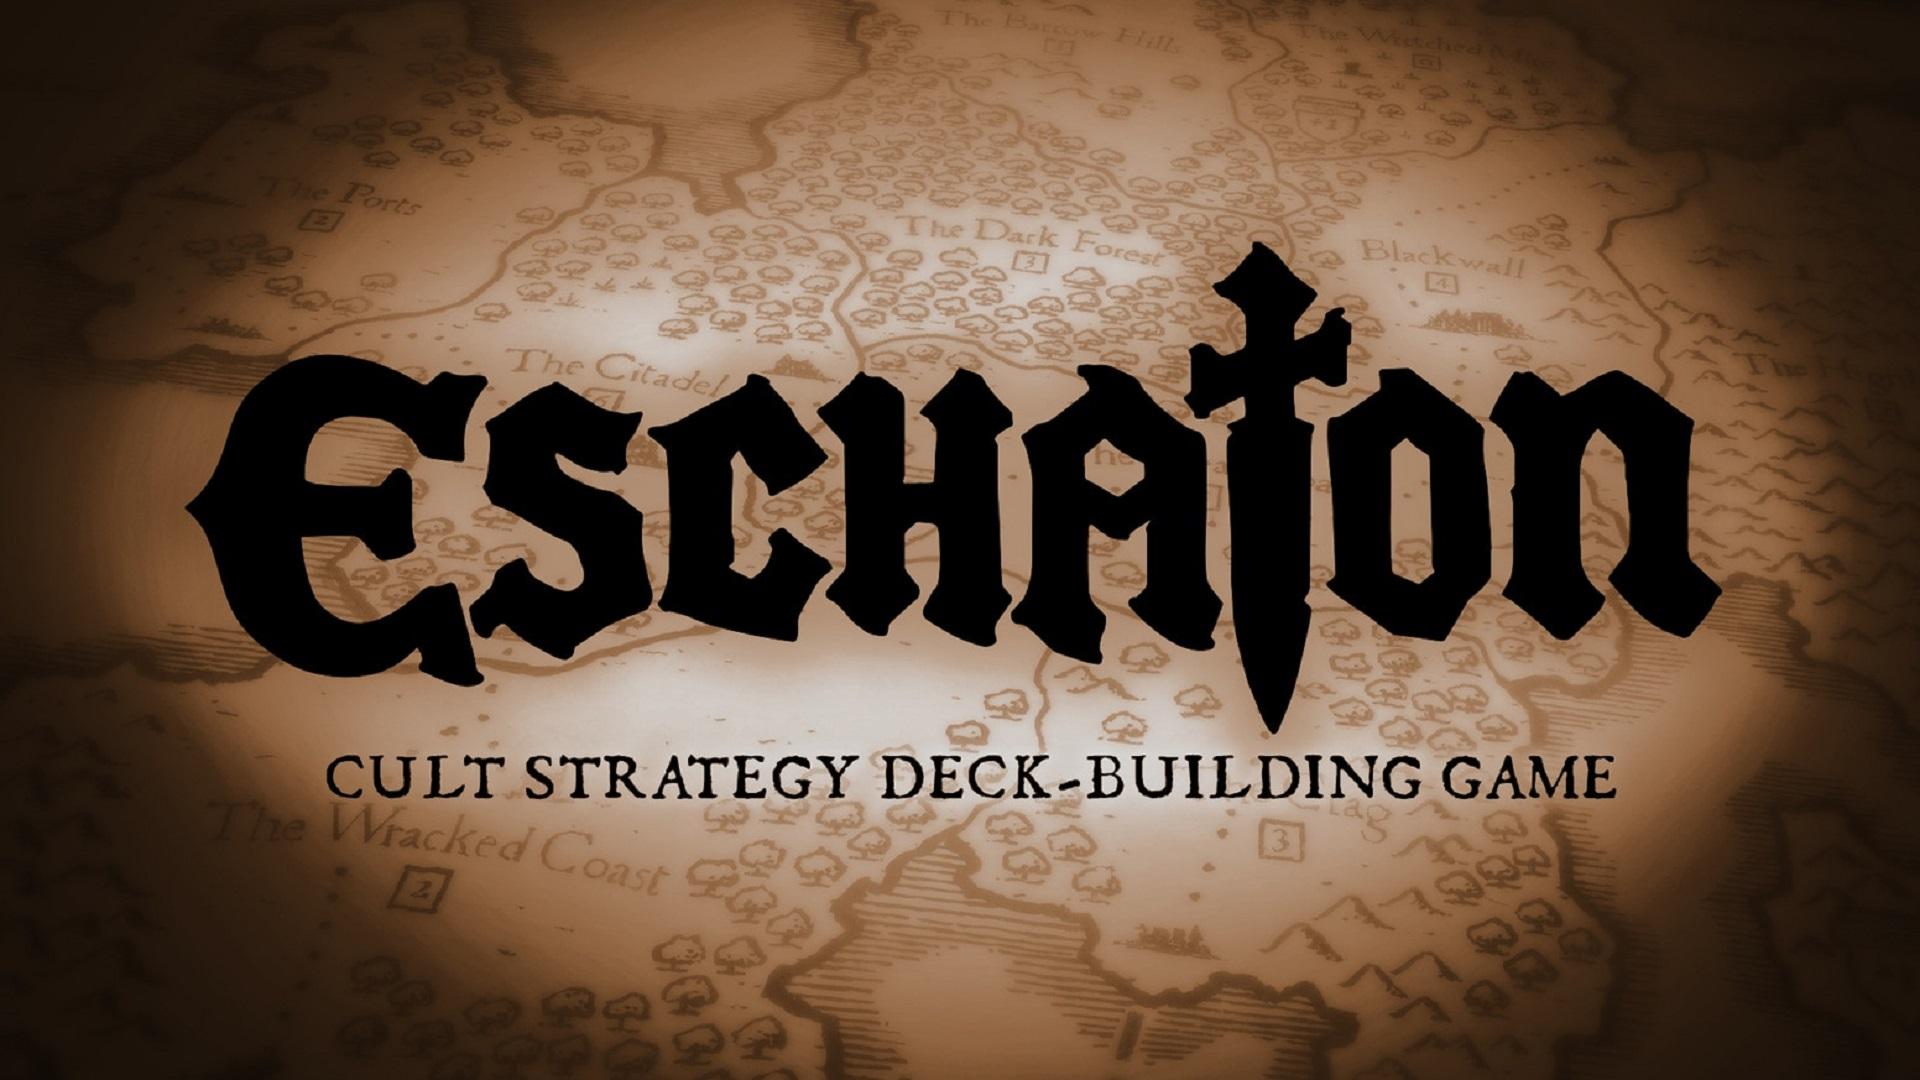 gen-con-2017-eschaton-is-back-and-better-than-ever-social.jpg